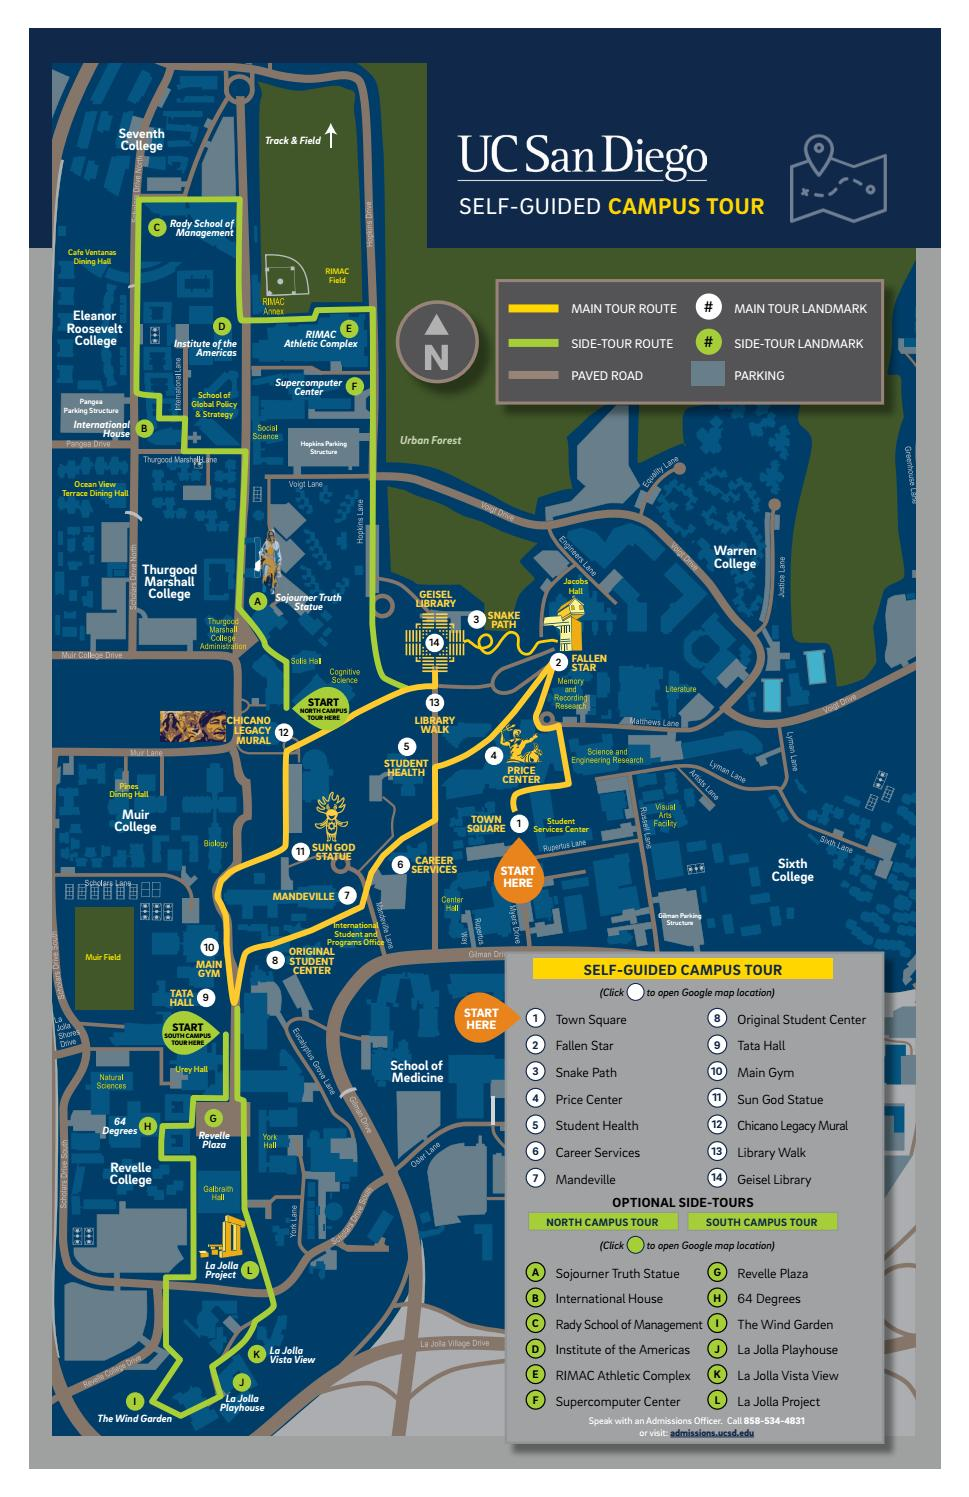 Uc San Diego Map UC San Diego Self Guided Tour Map by UC San Diego Admissions   issuu